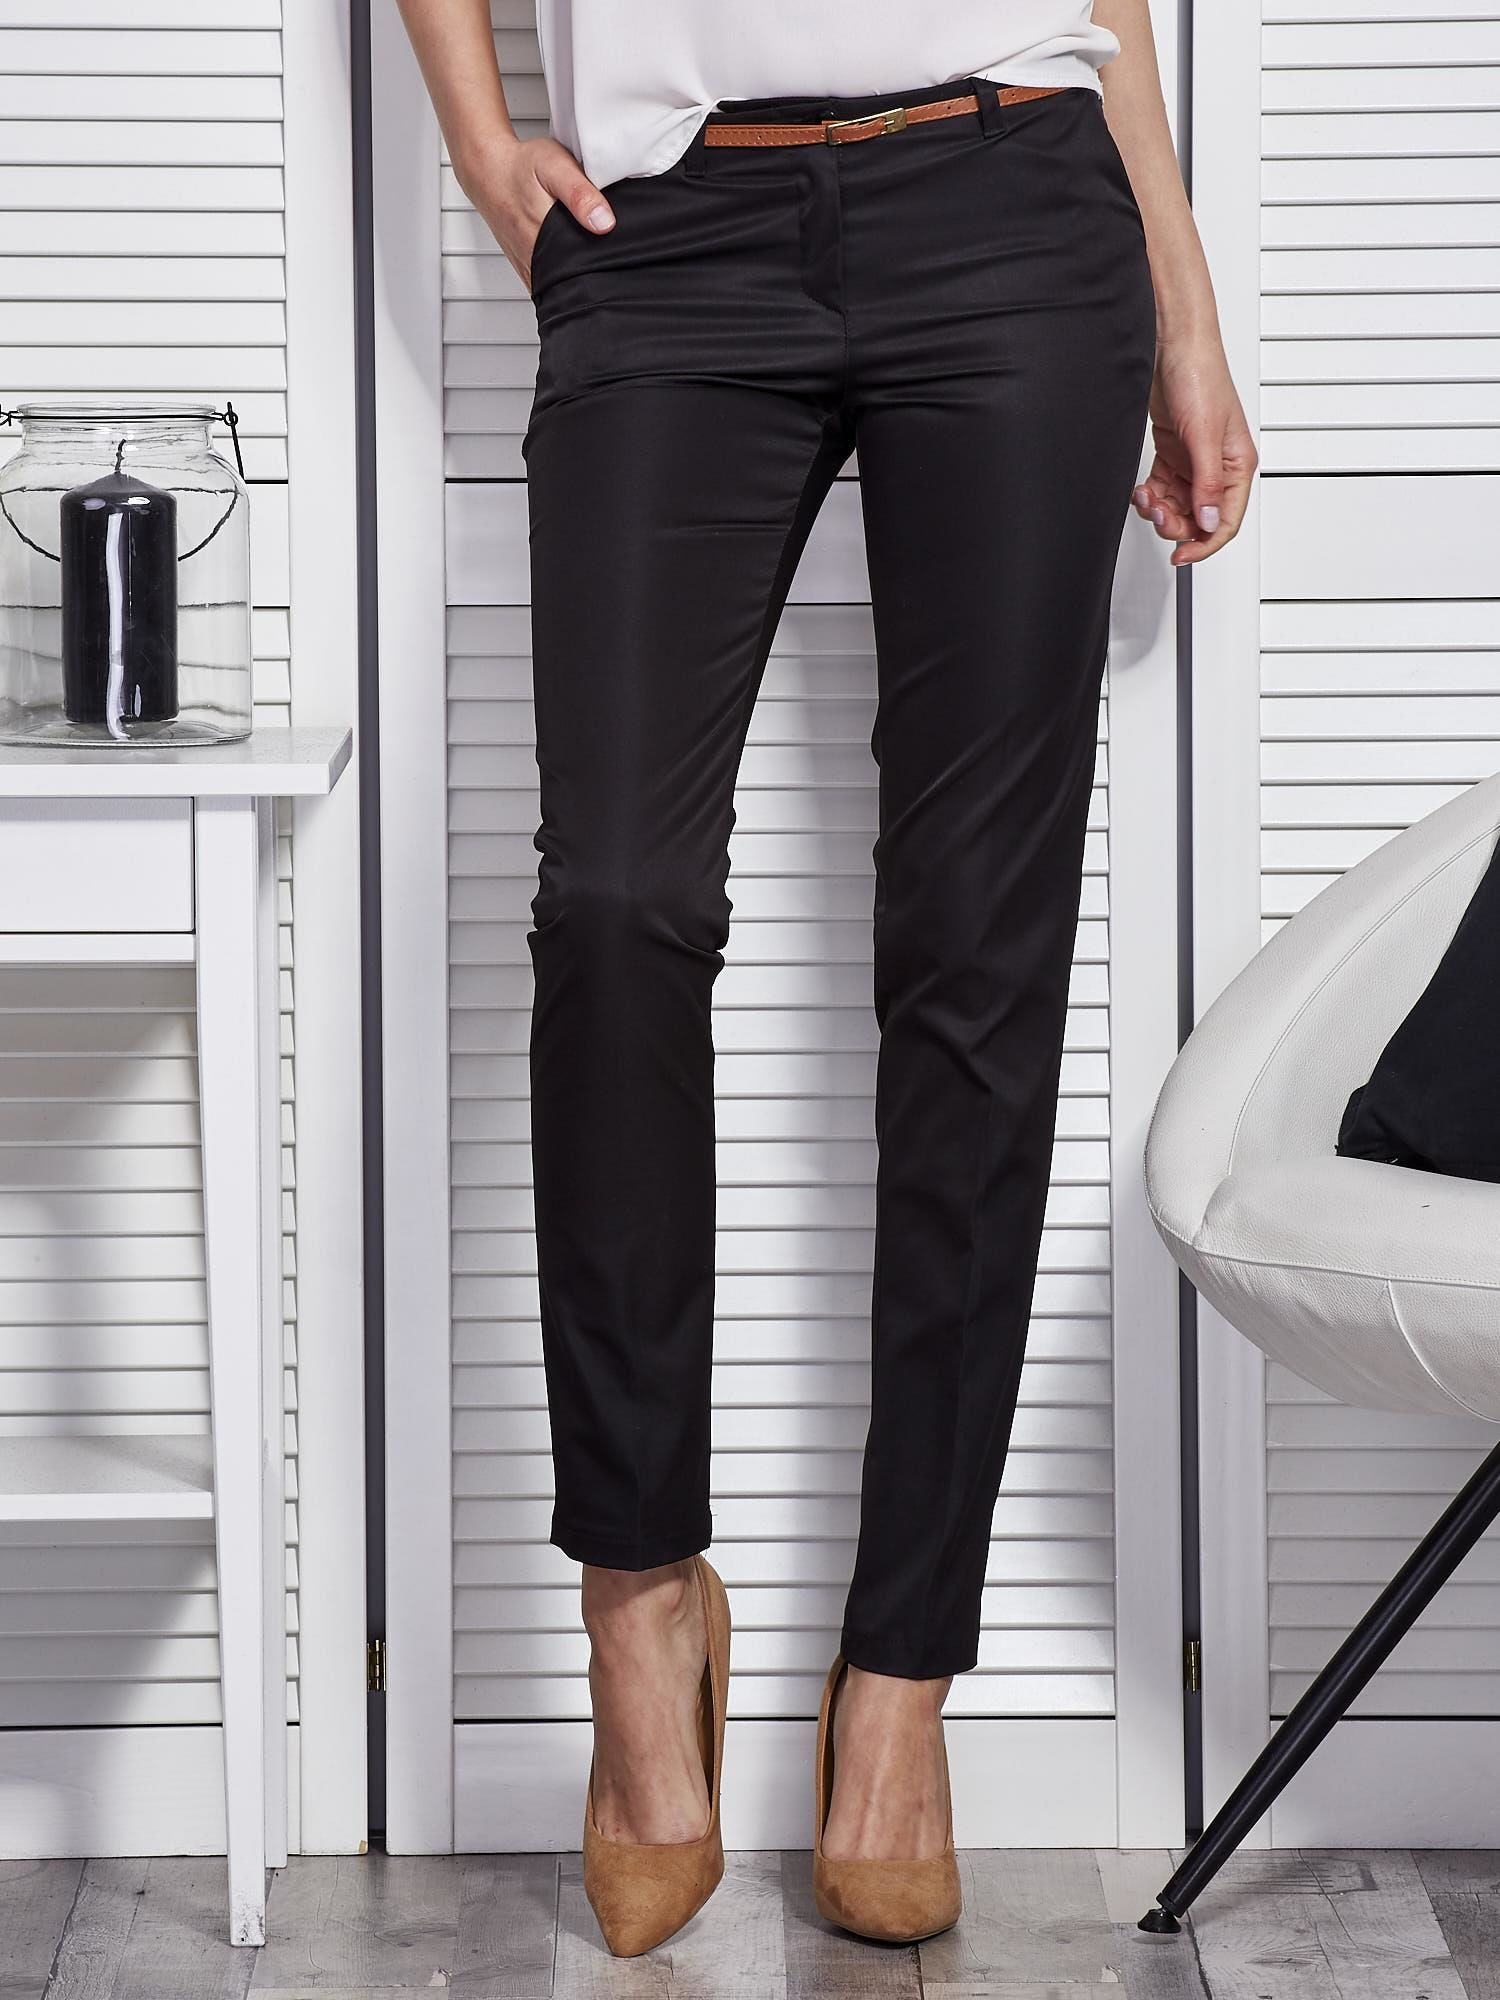 a3f3adbc14 Czarne eleganckie spodnie damskie z paskiem - Spodnie z materiału ...